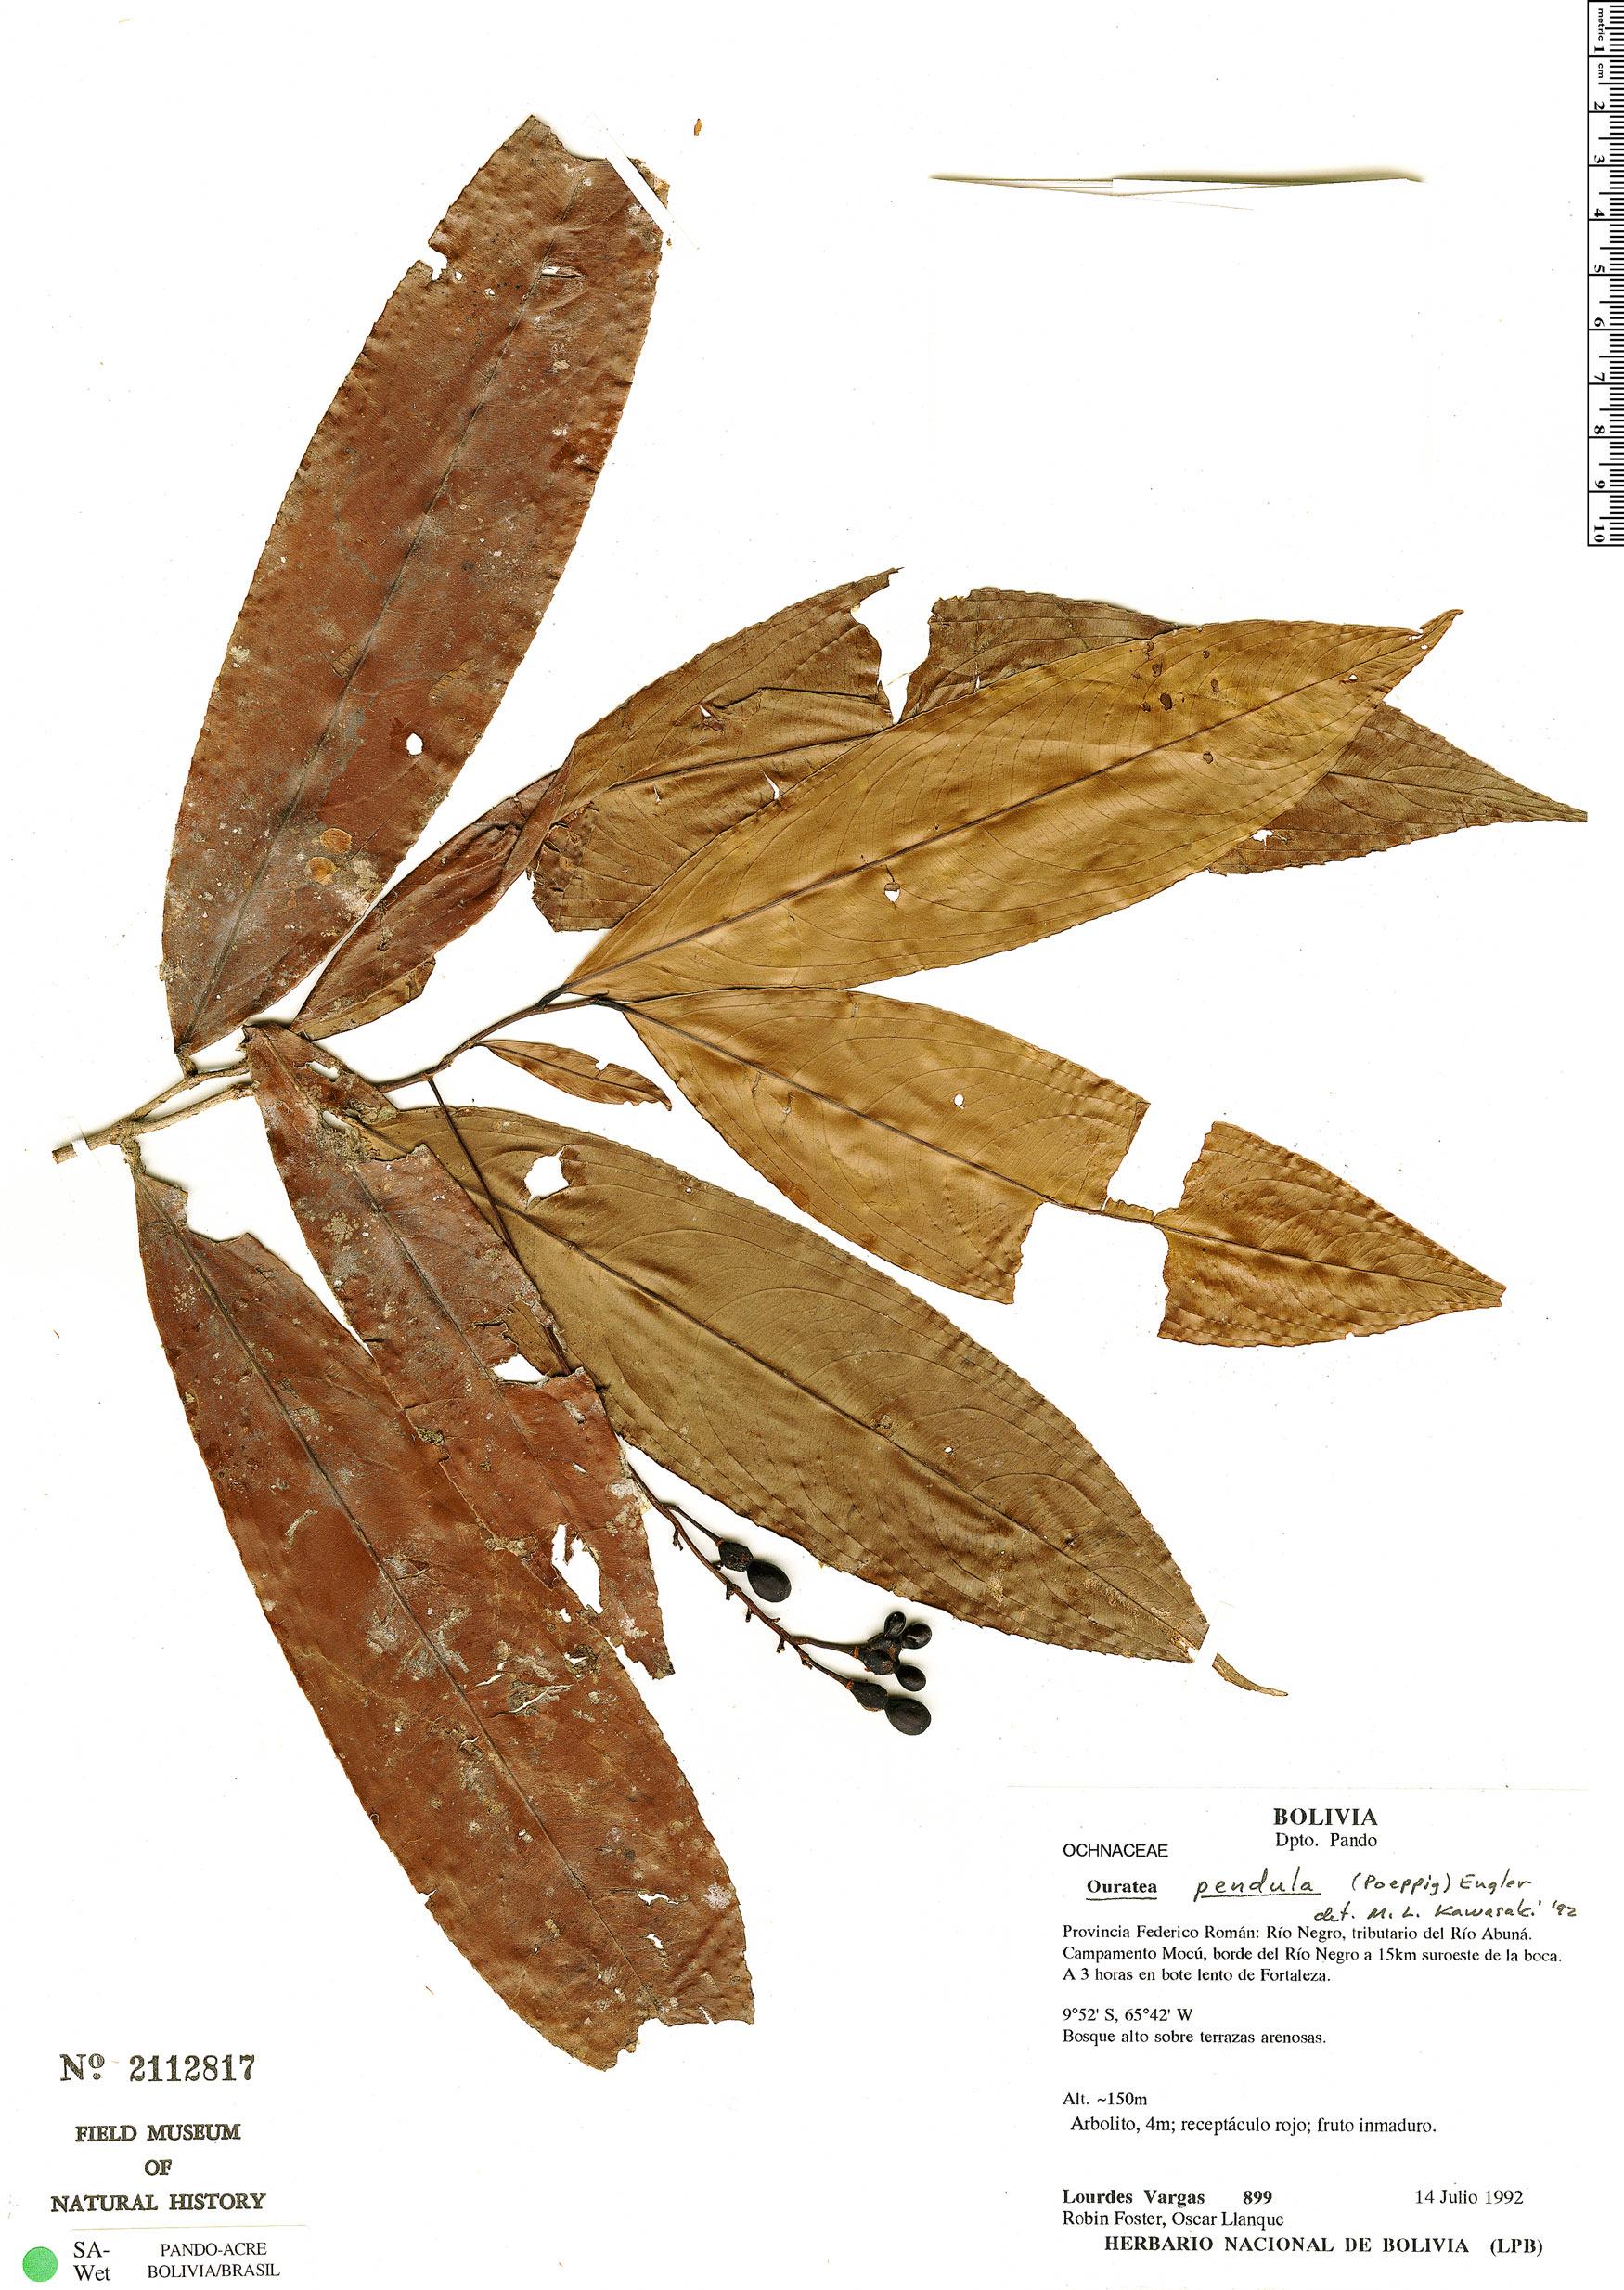 Specimen: Ouratea pendula